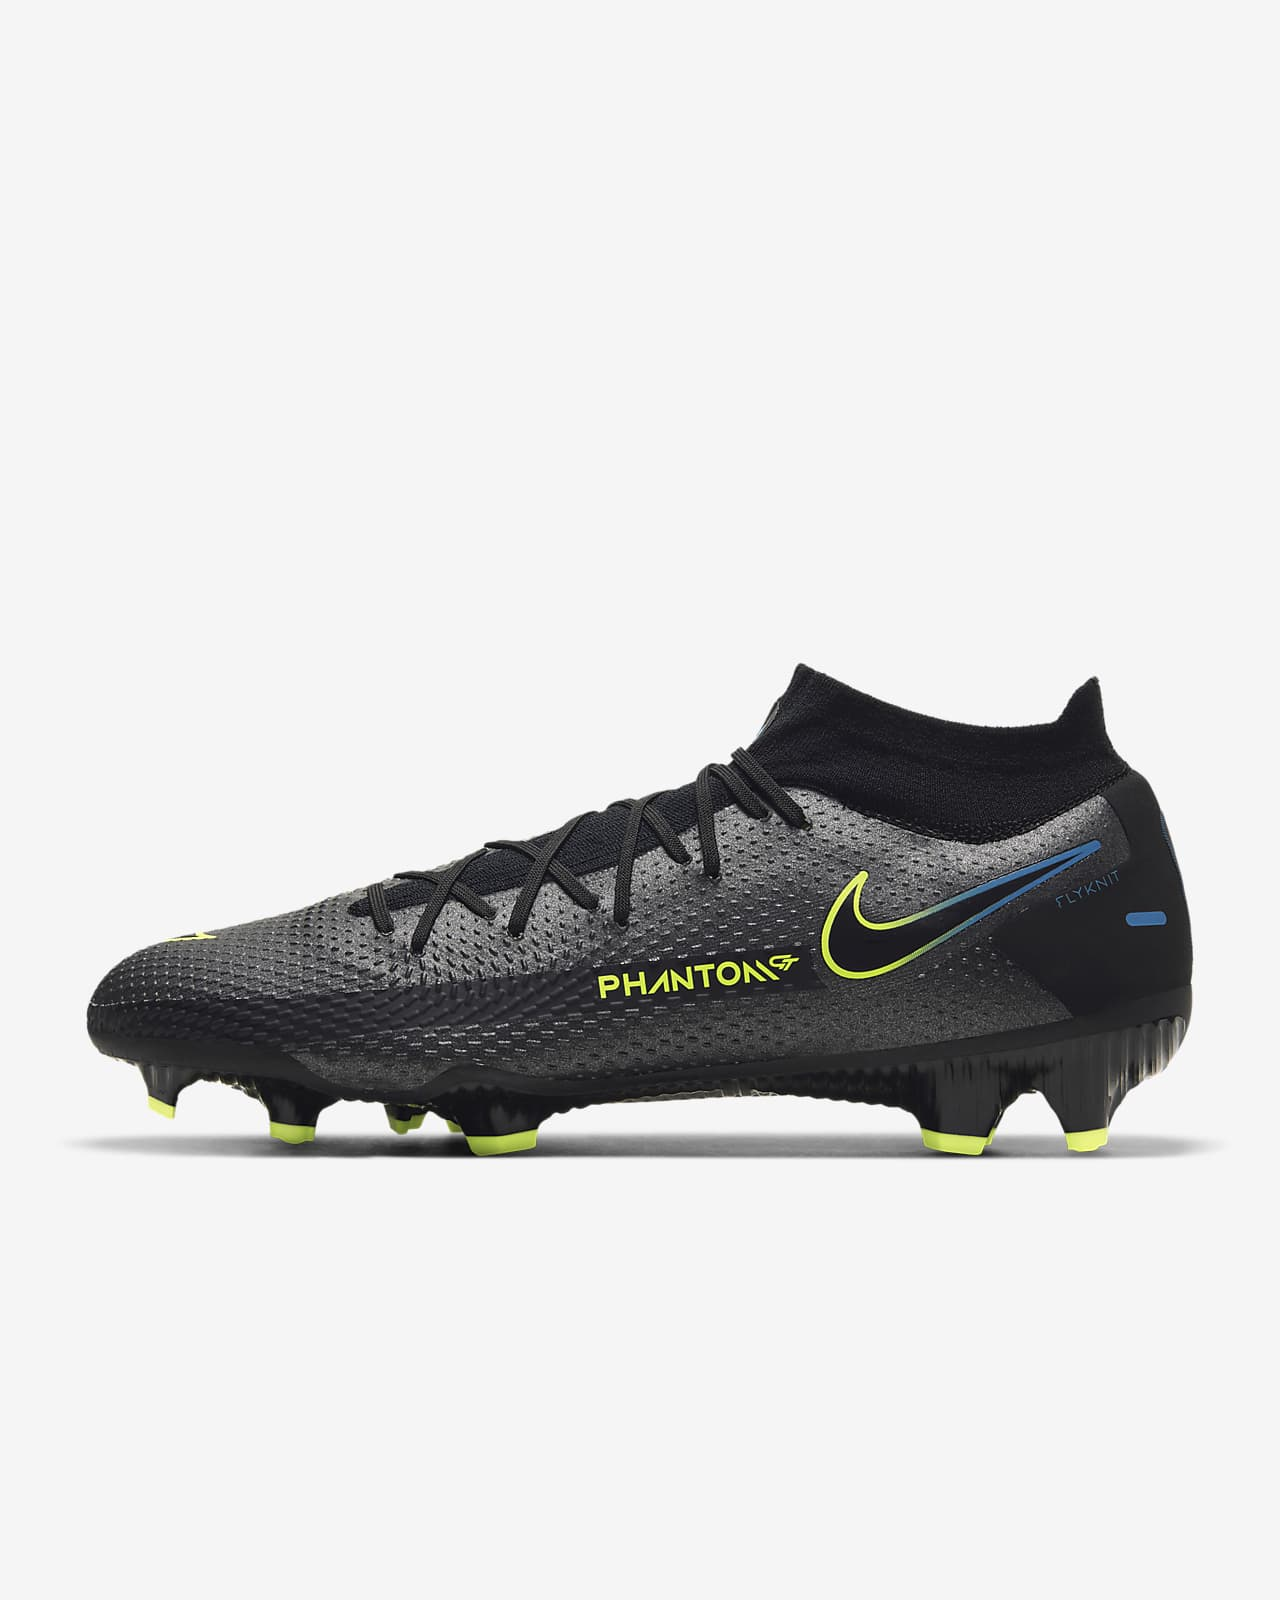 Nike Phantom GT Pro Dynamic Fit FG Voetbalschoen (stevige ondergrond)